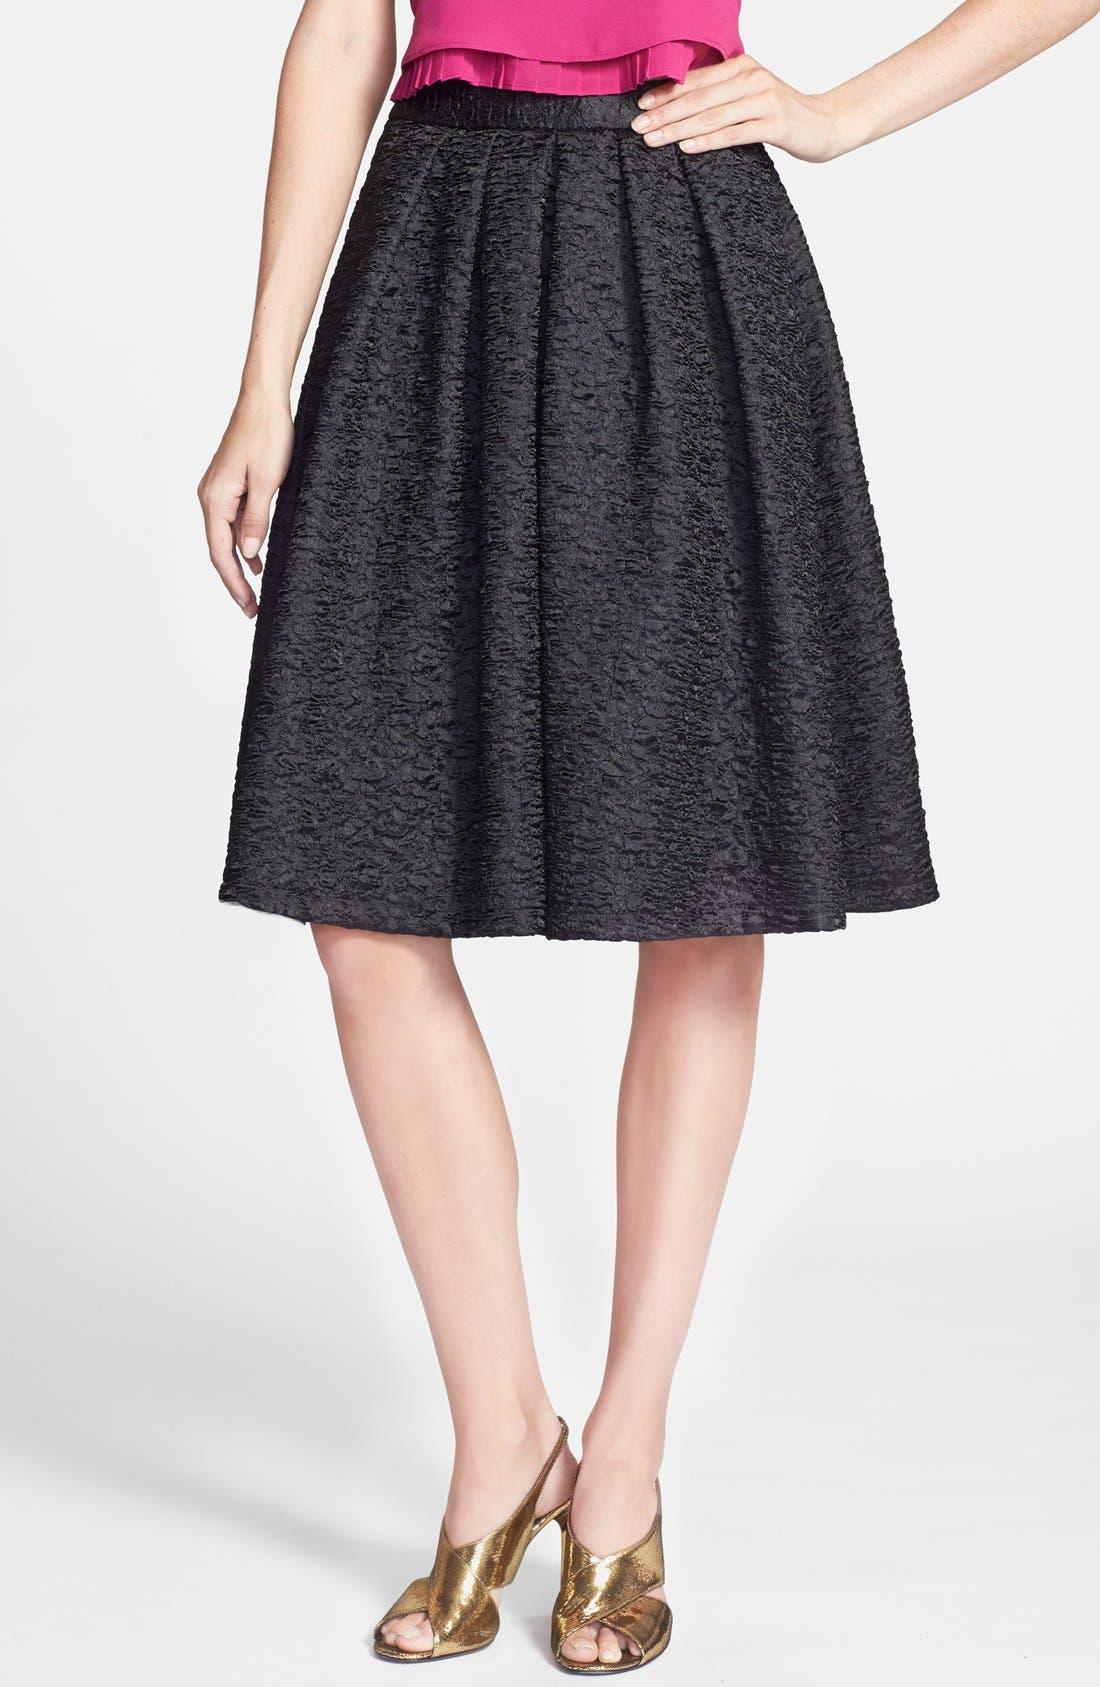 Alternate Image 1 Selected - ASTR Textured Pleat Skirt